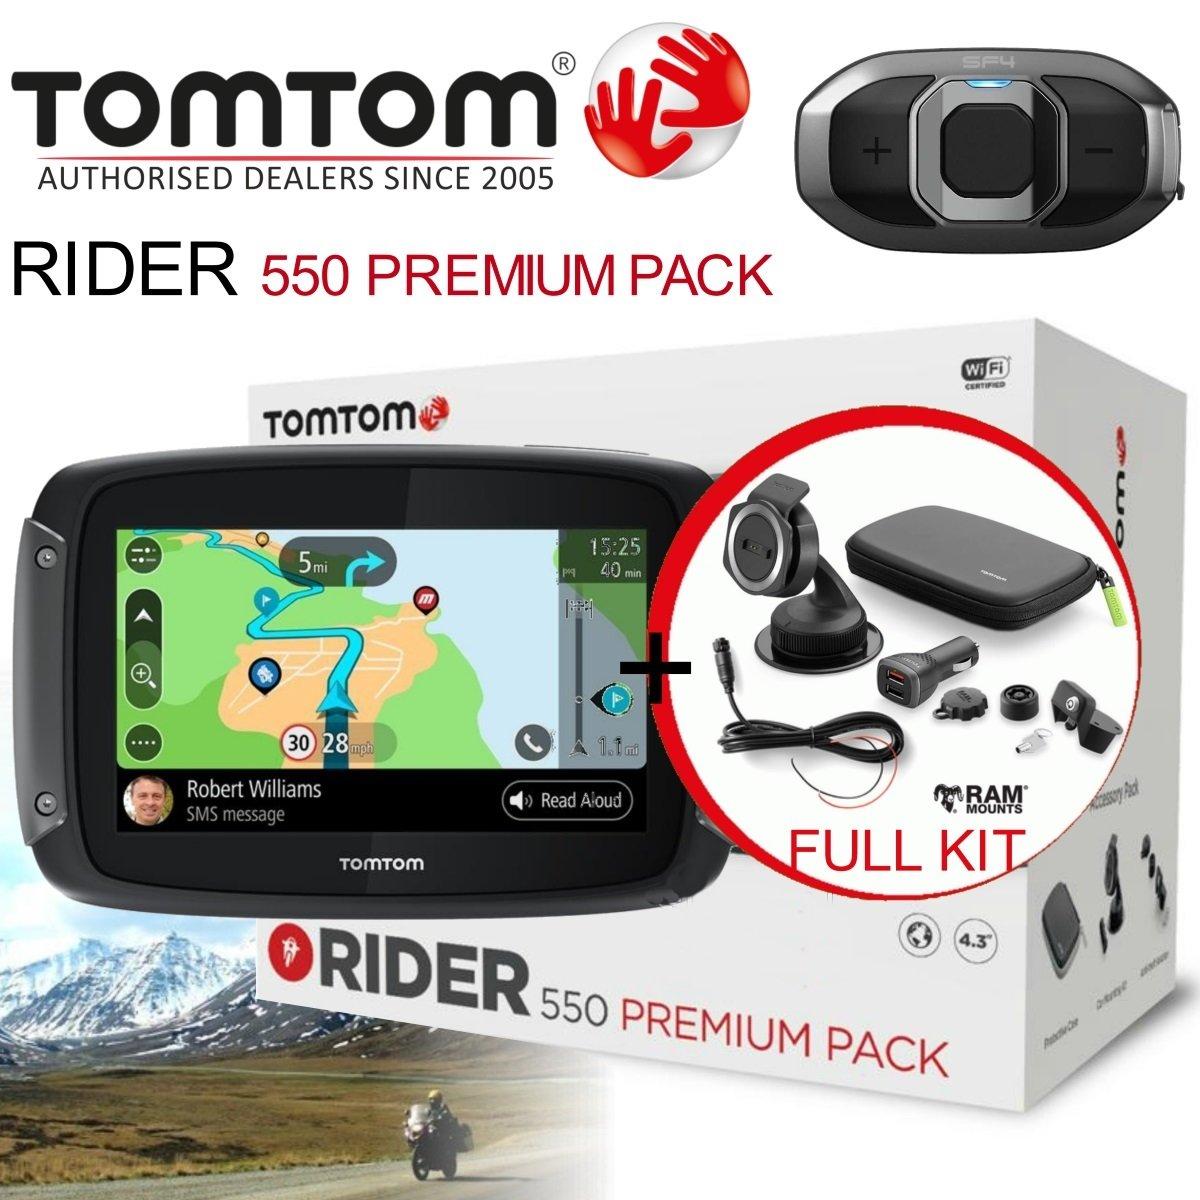 TomTom Rider 550 World Premium Pack + Interkom SF4 ZDARMA